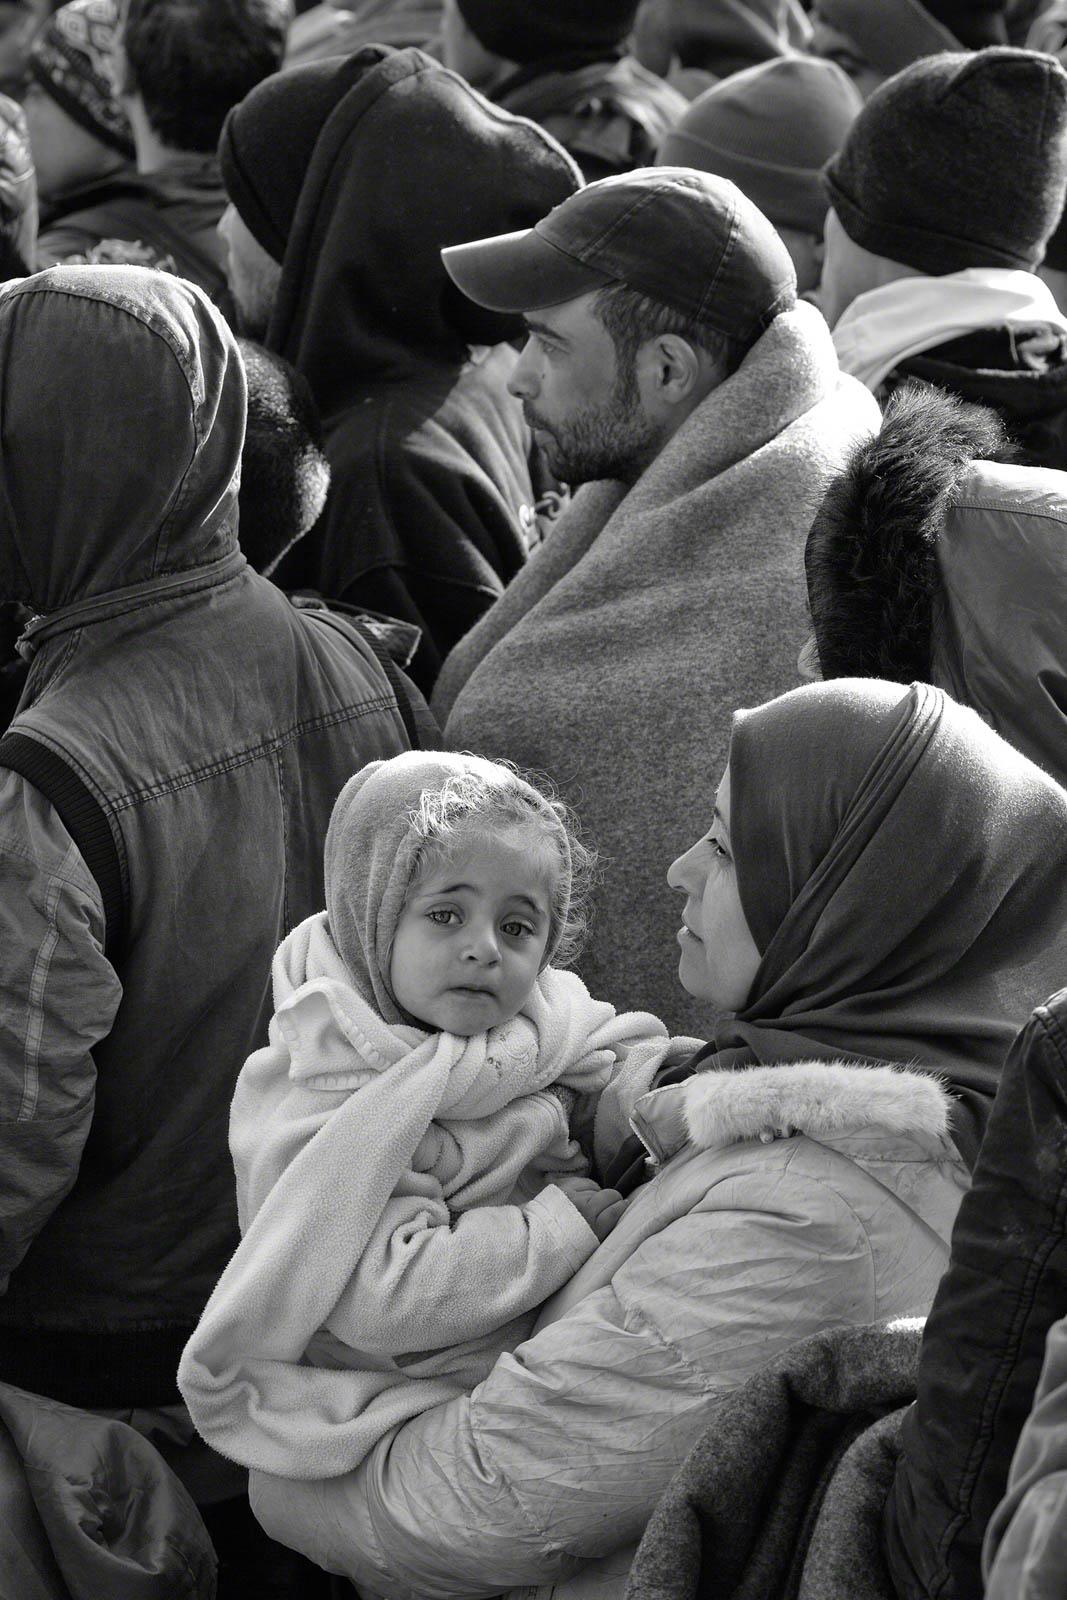 امرأة تحمل طفلا وسط حشد من الناس (© Tom Stoddart/Getty Images/Courtesy of Annenberg Space for Photography)